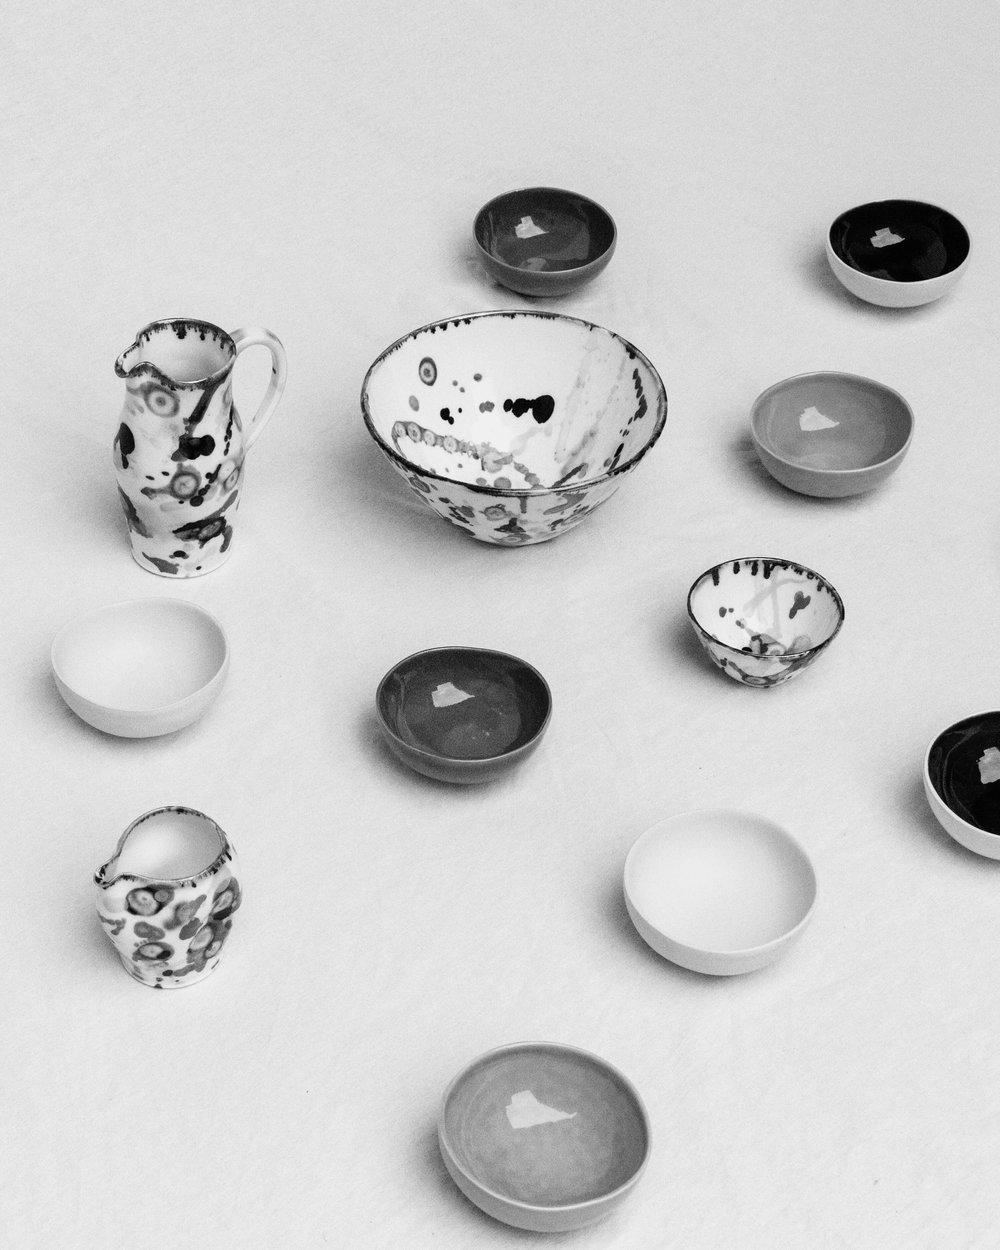 Ceramics - Hannah Gabrielle More Photography